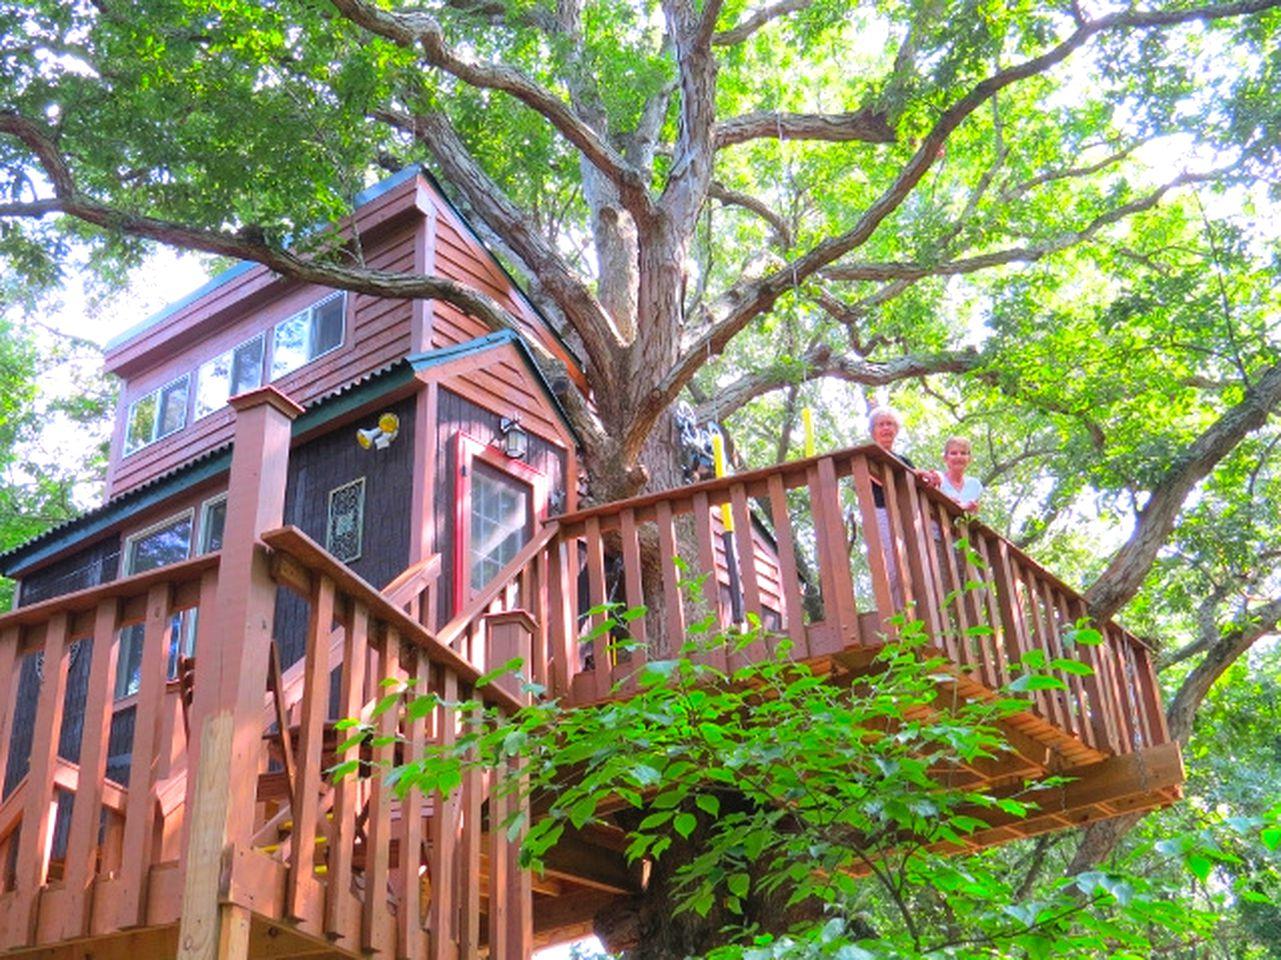 Gorgeous Tree House near Shawnee National Forest, Illinois